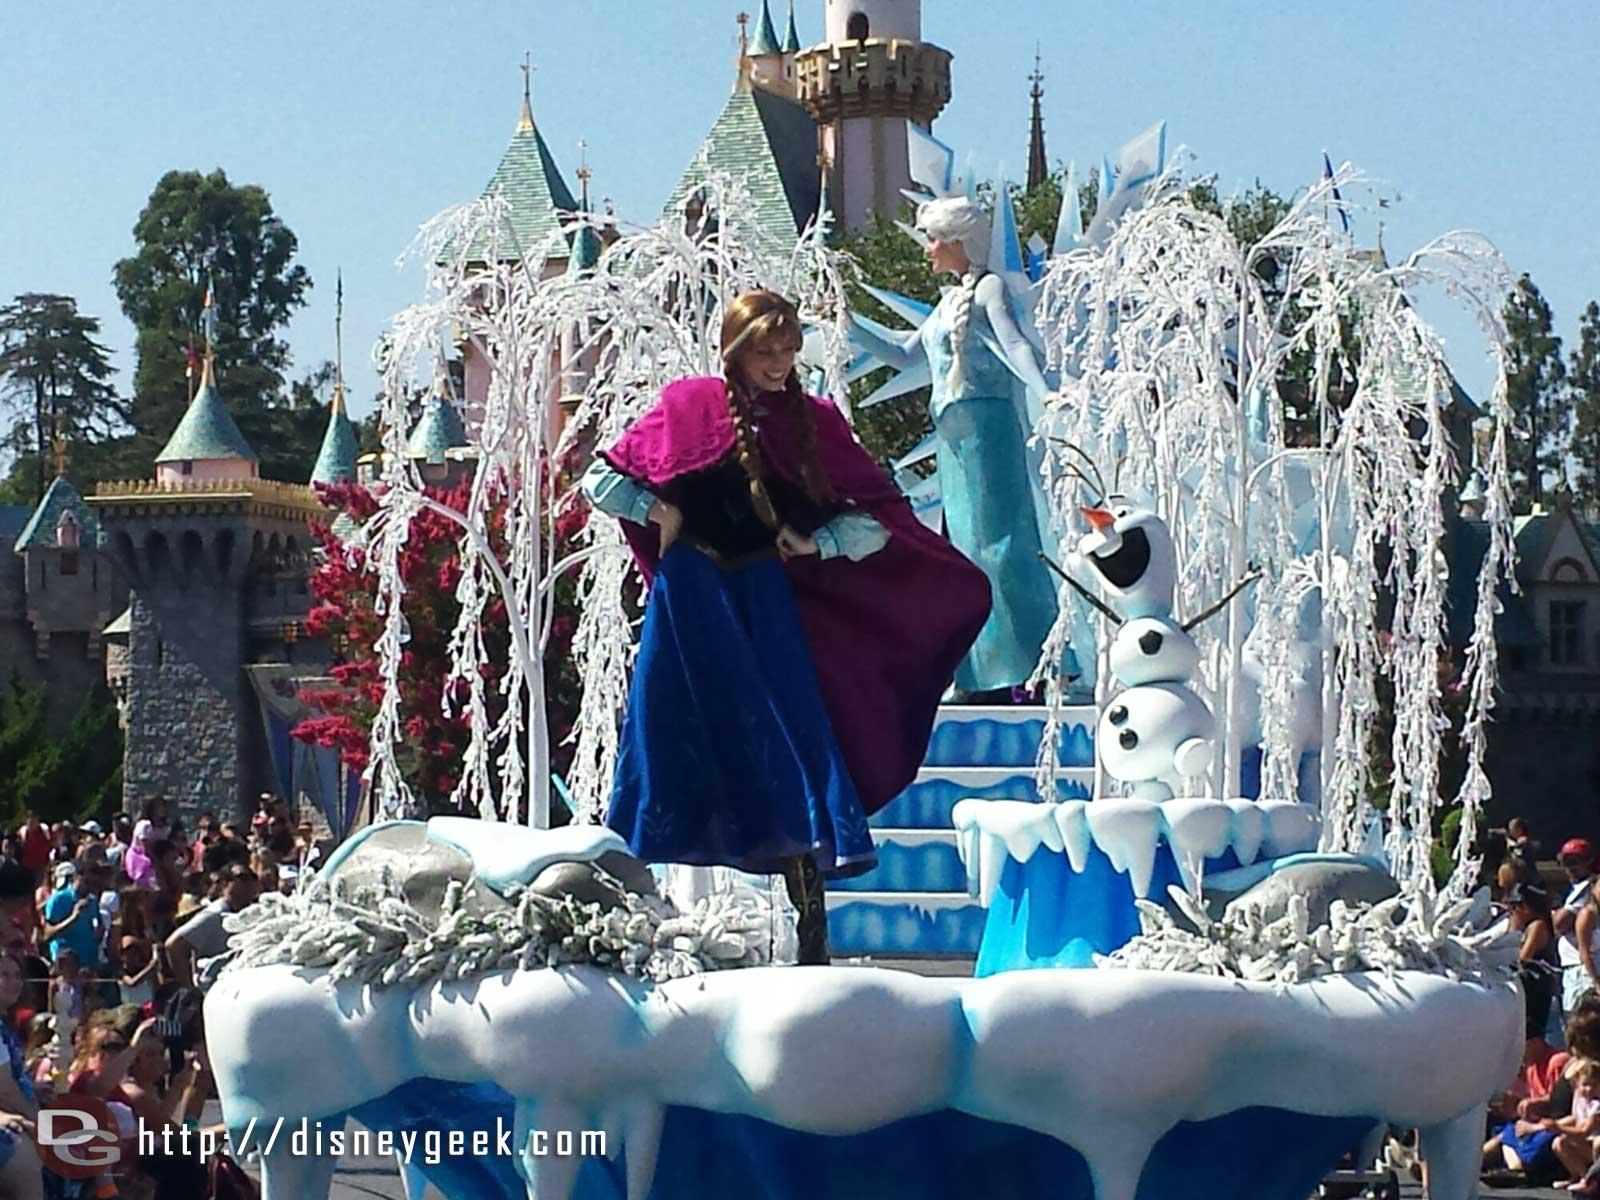 #Frozen pre-parade featuring Anna, Elsa & Olaf #Disneyland